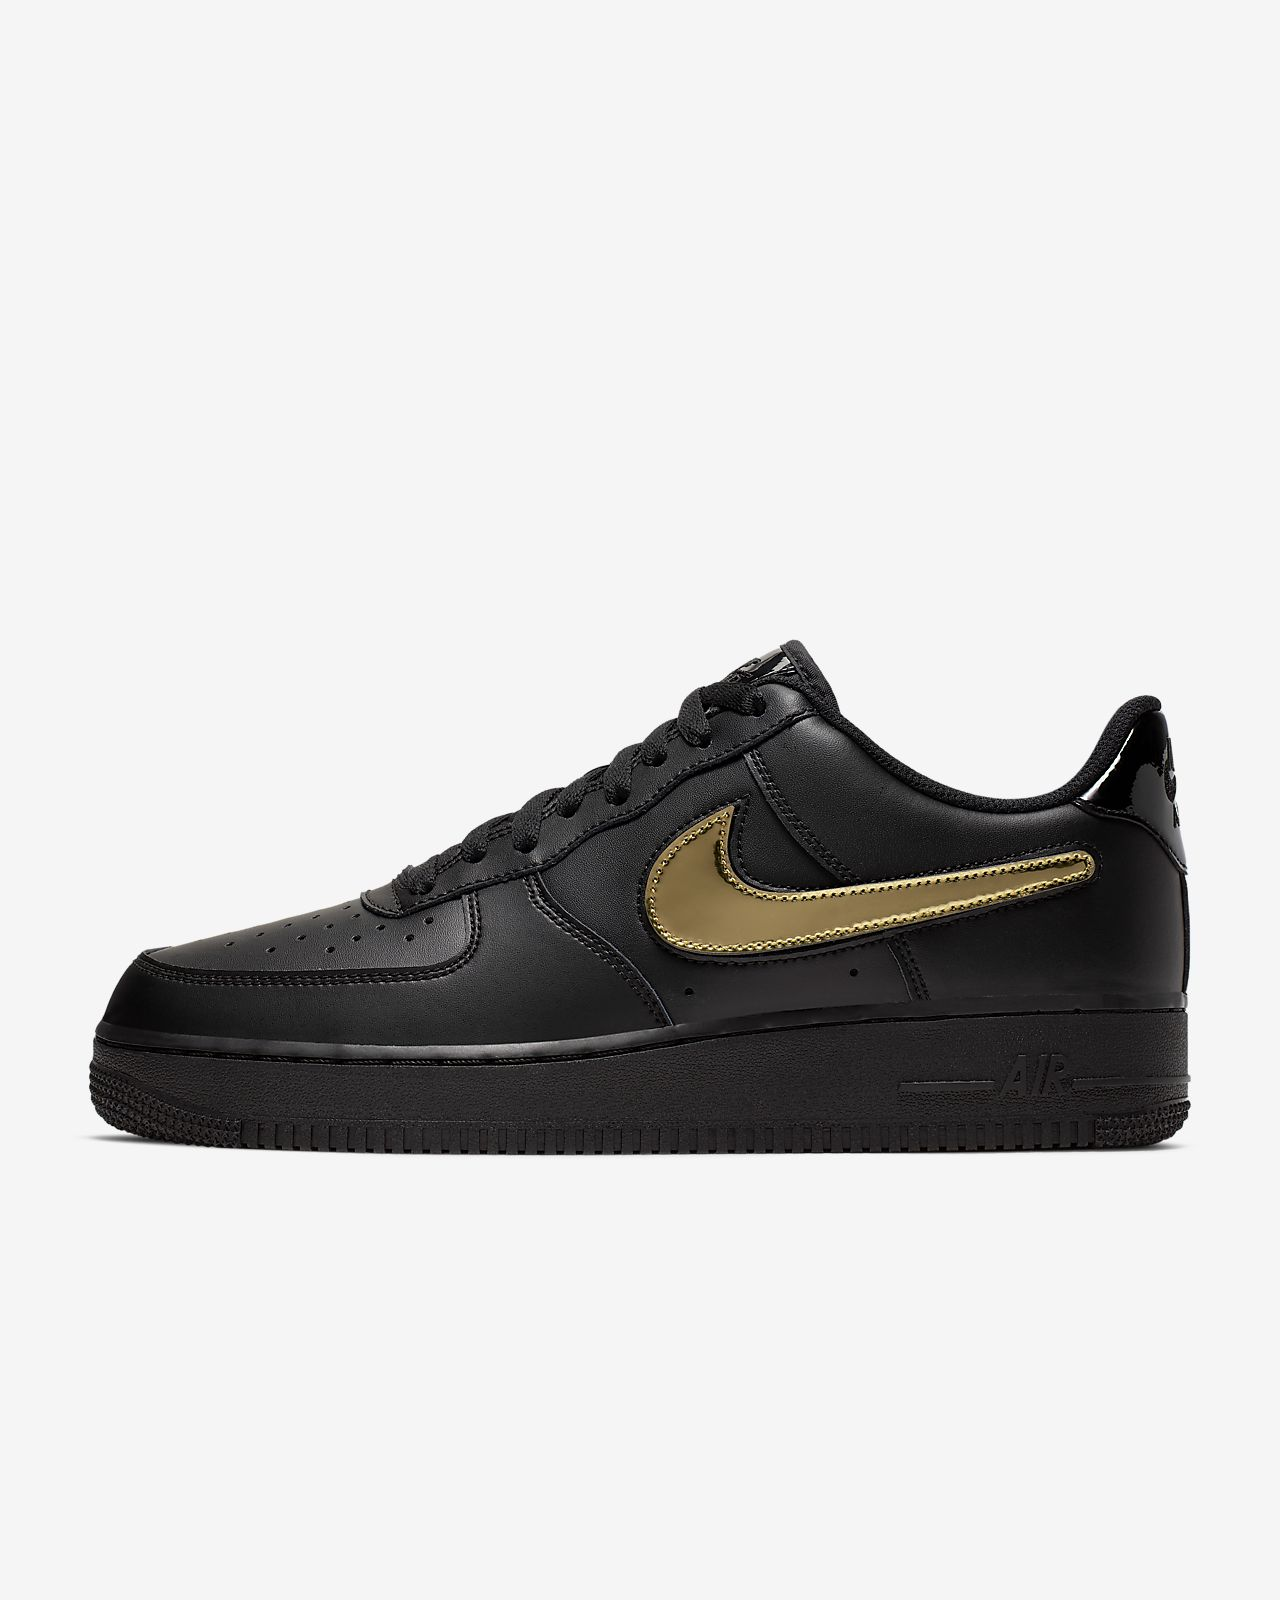 Nike Air Force 1 '07 LV8 3 Zapatillas Hombre